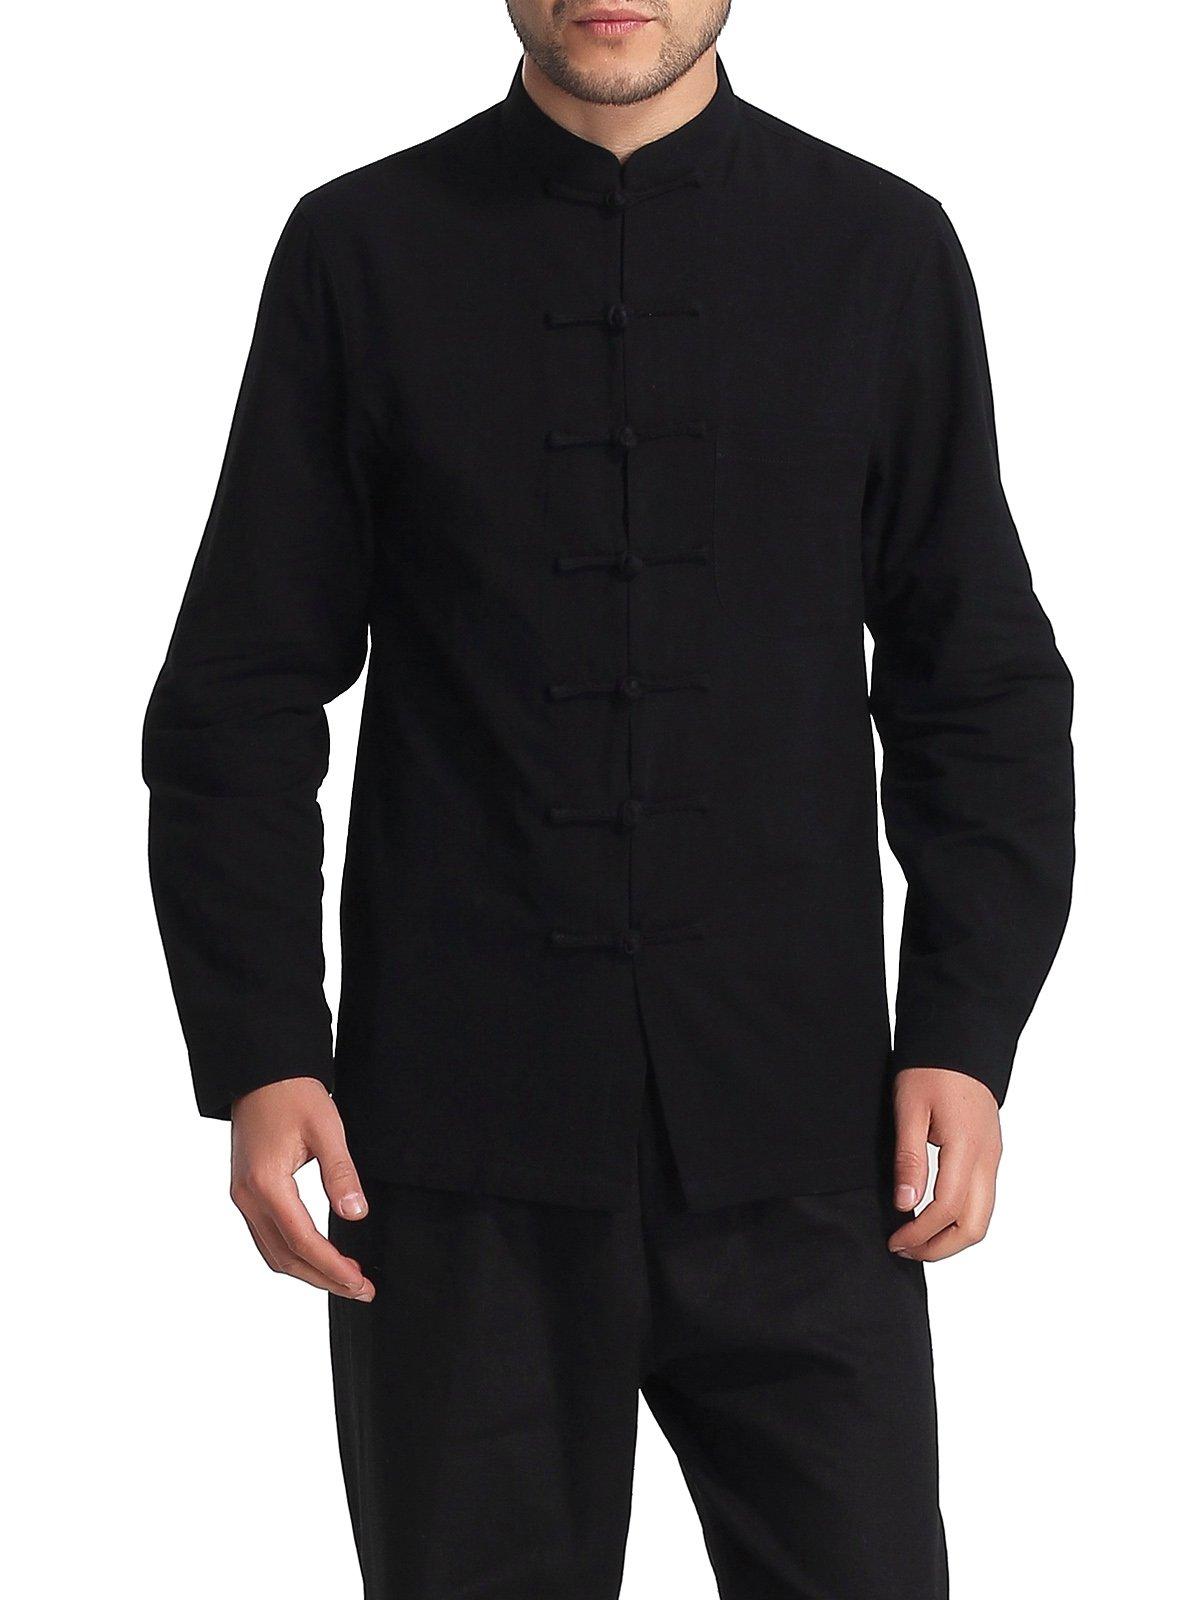 Bitablue Men's Chinese Traditional Style Cotton Shirt (Black, Large)